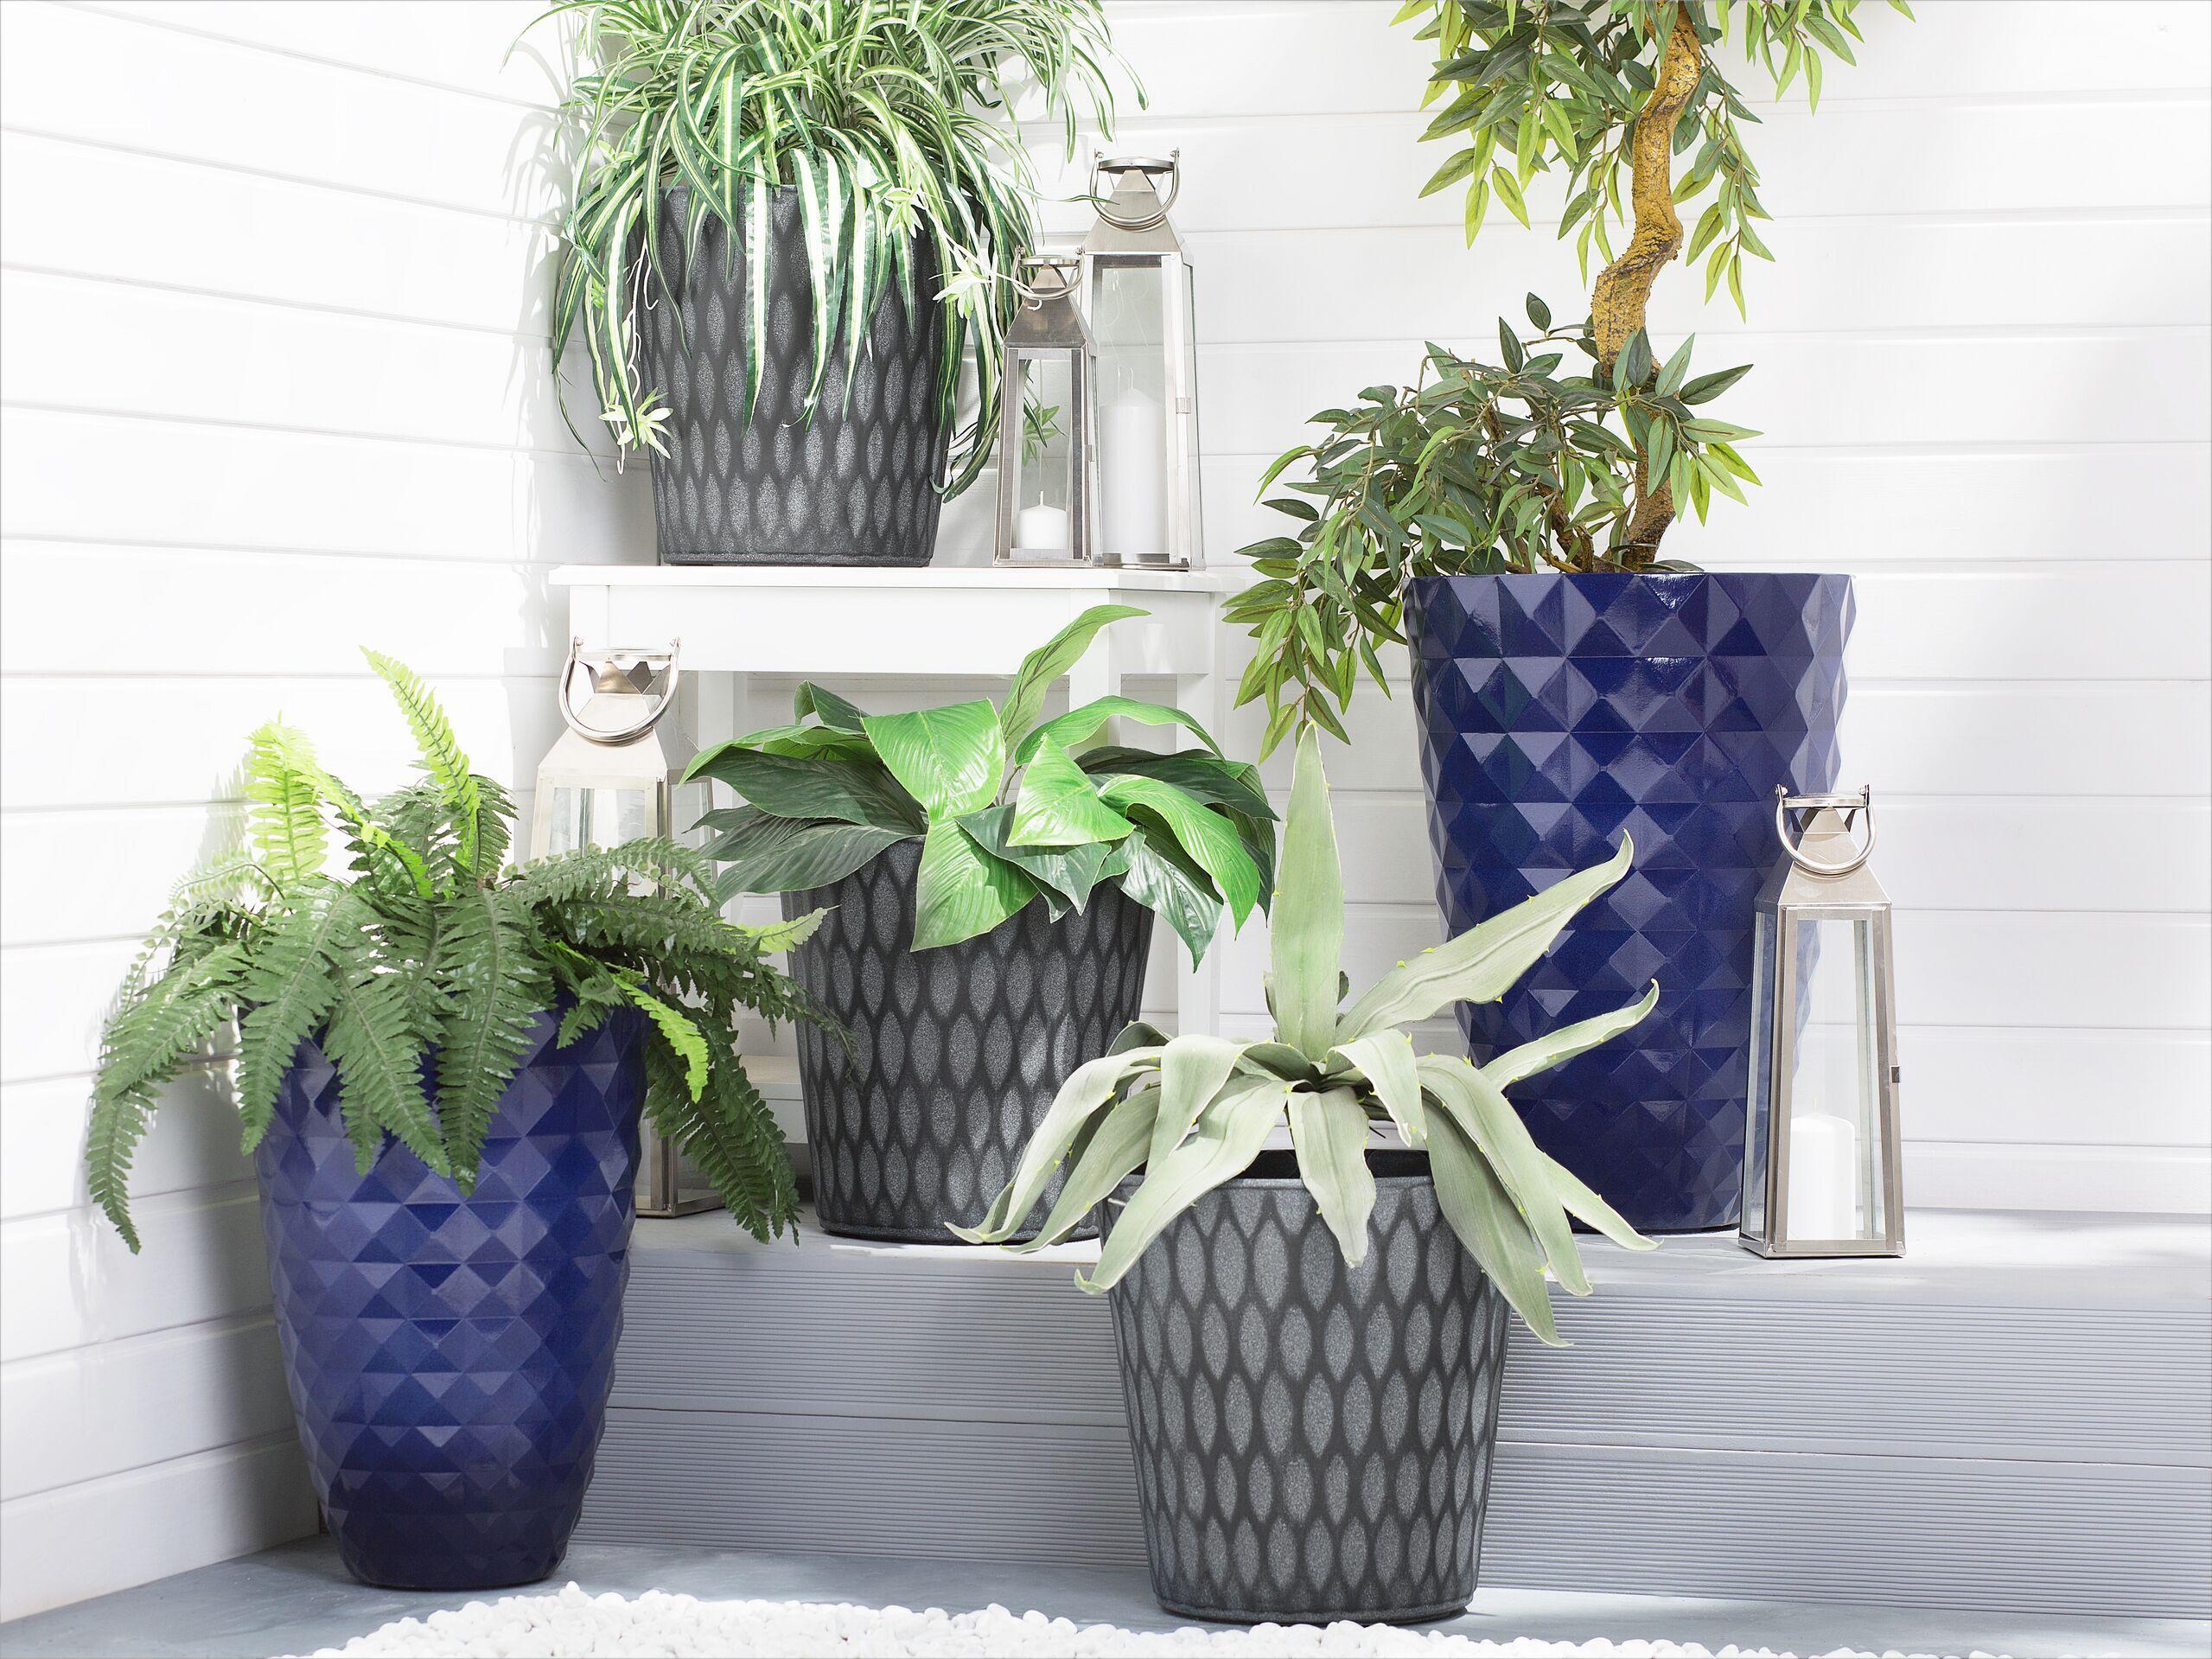 beliani set di 2 vasi per piante rotondi in argilla blu navy design moderno